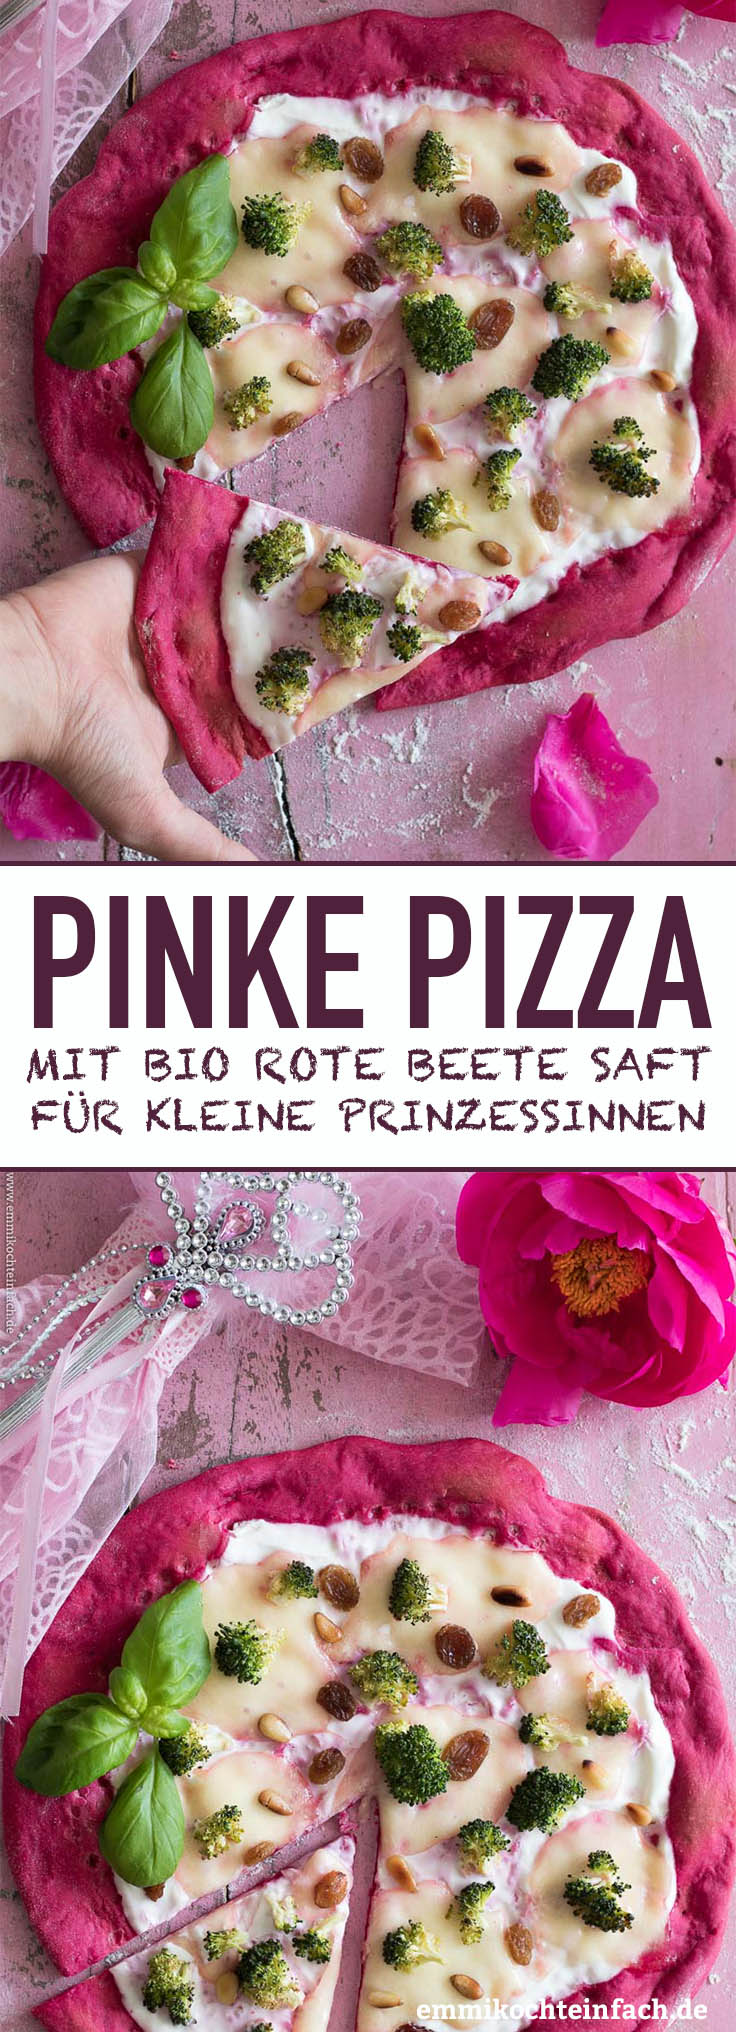 Pizza Principessa - Die Pinke Pizza - www.emmikochteinfach.de